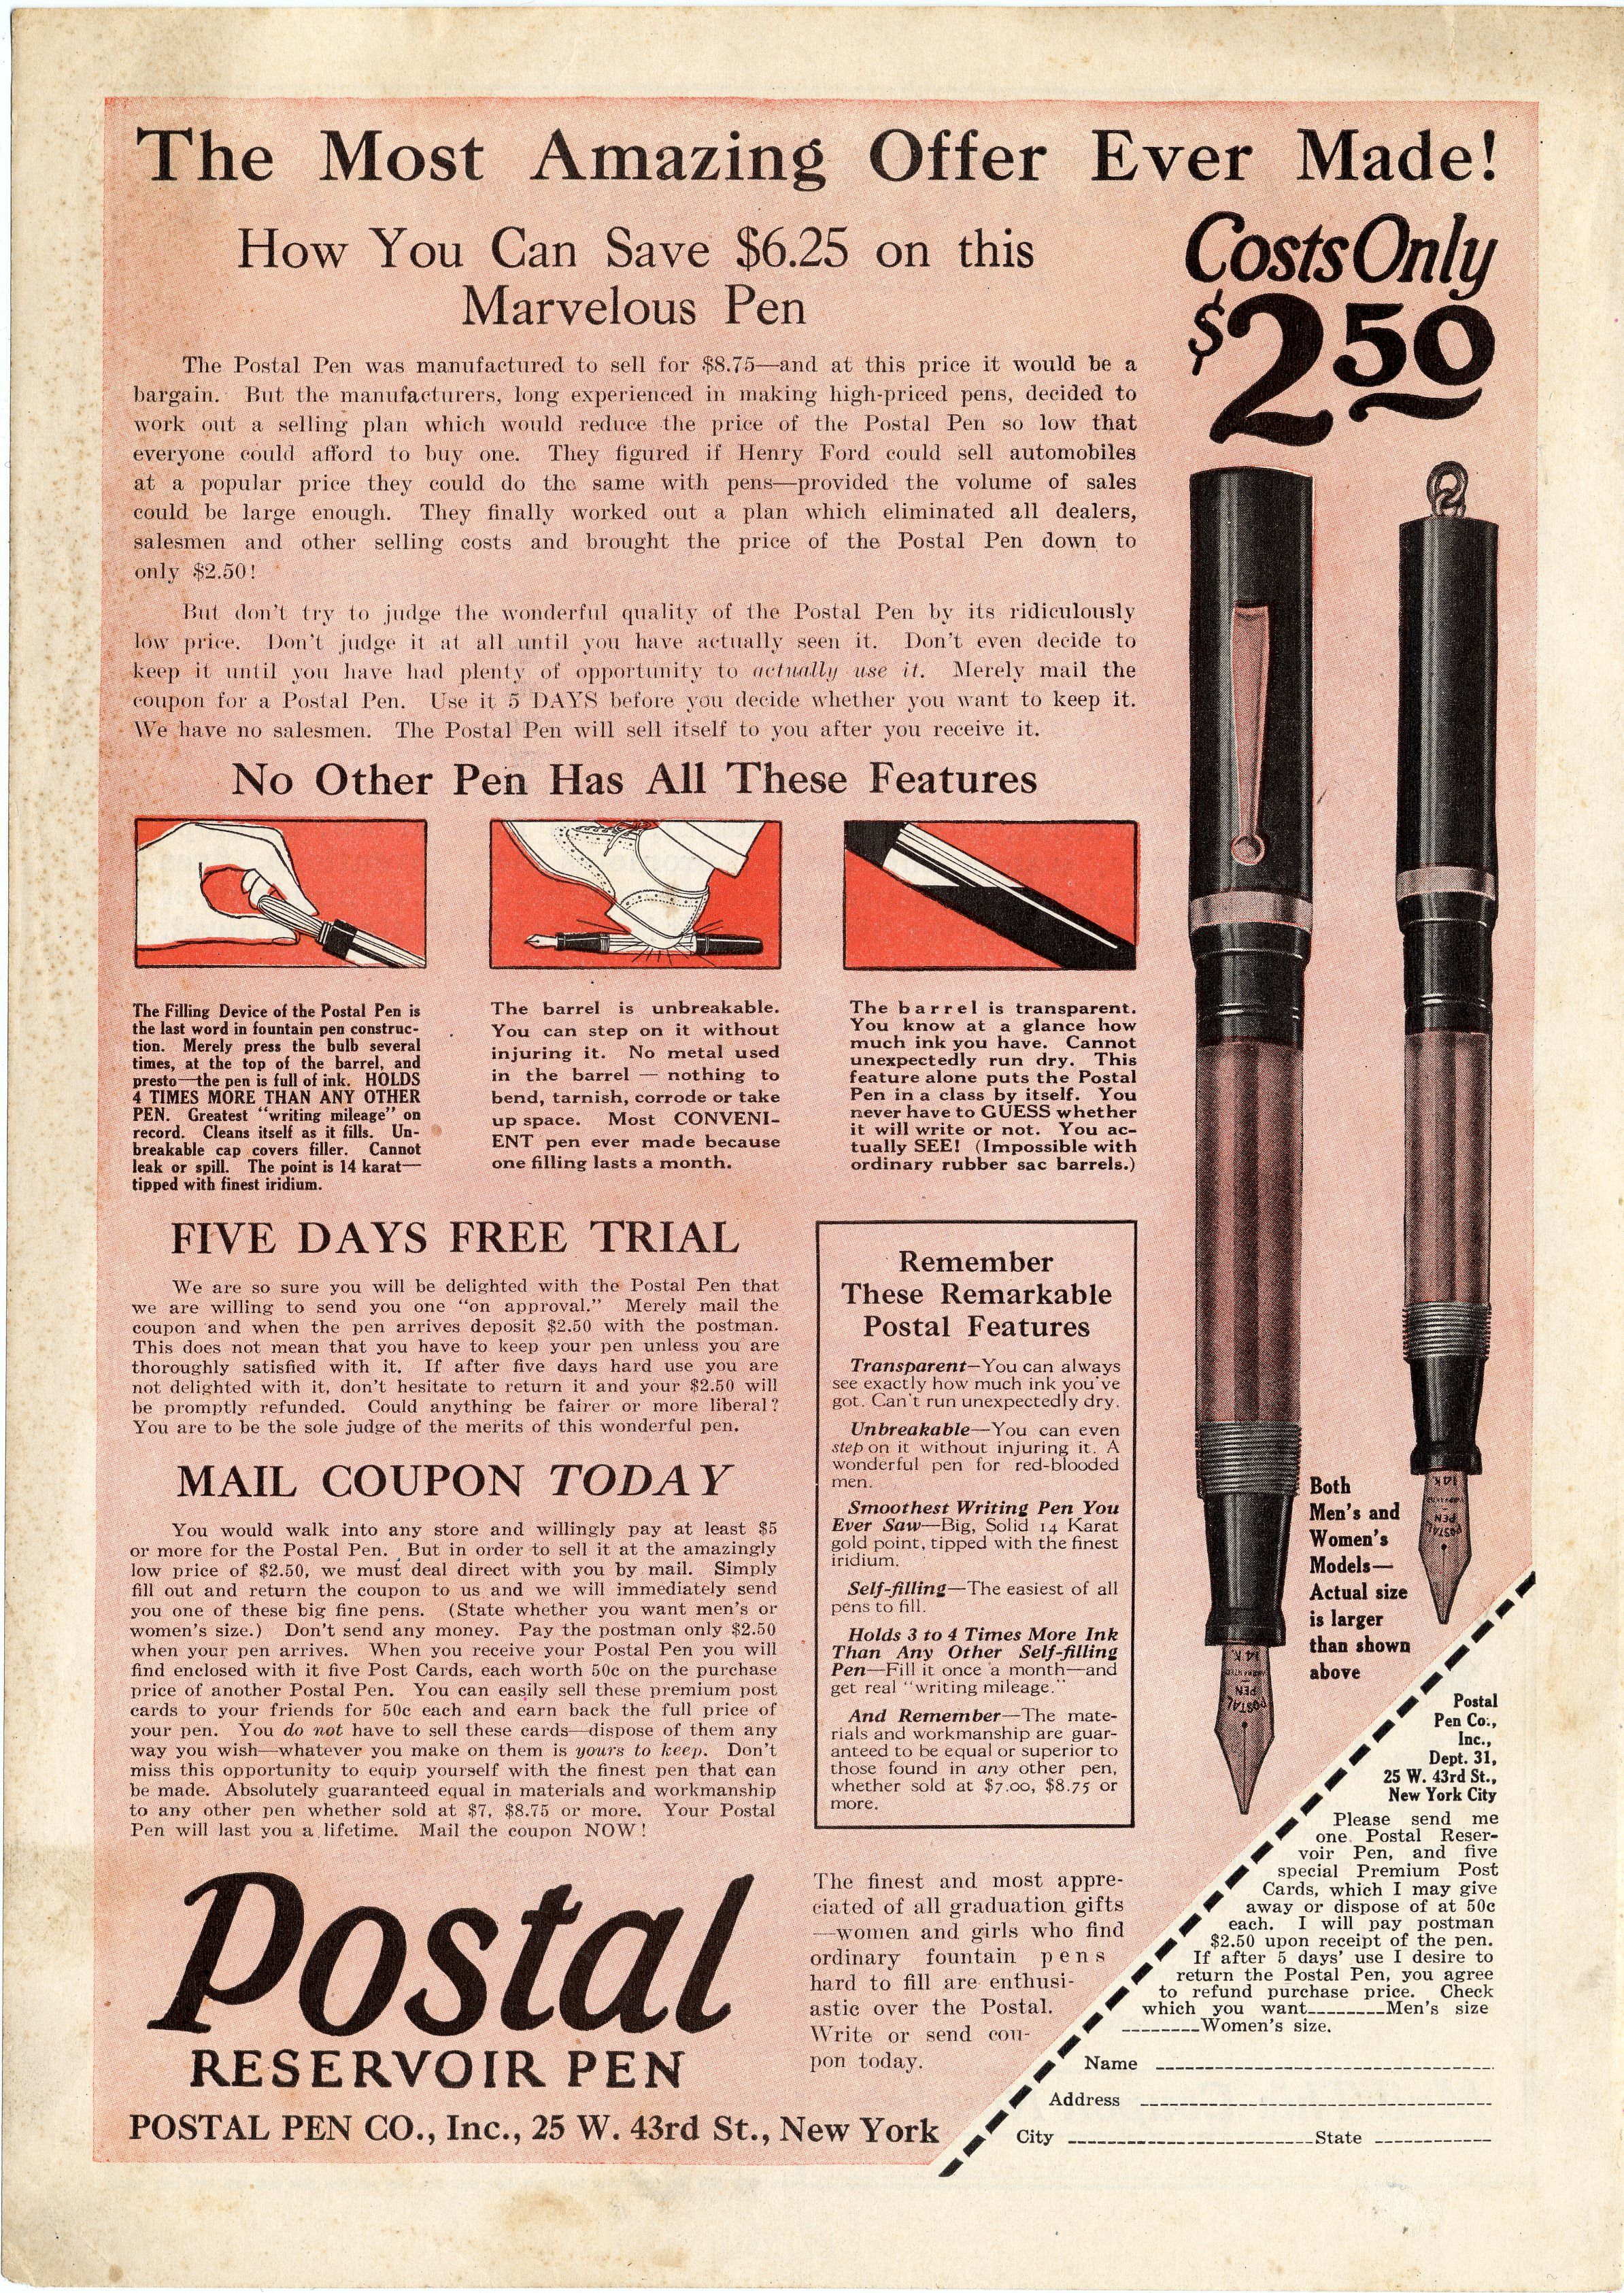 Postal Reservoir Pen advertisement, 1925.